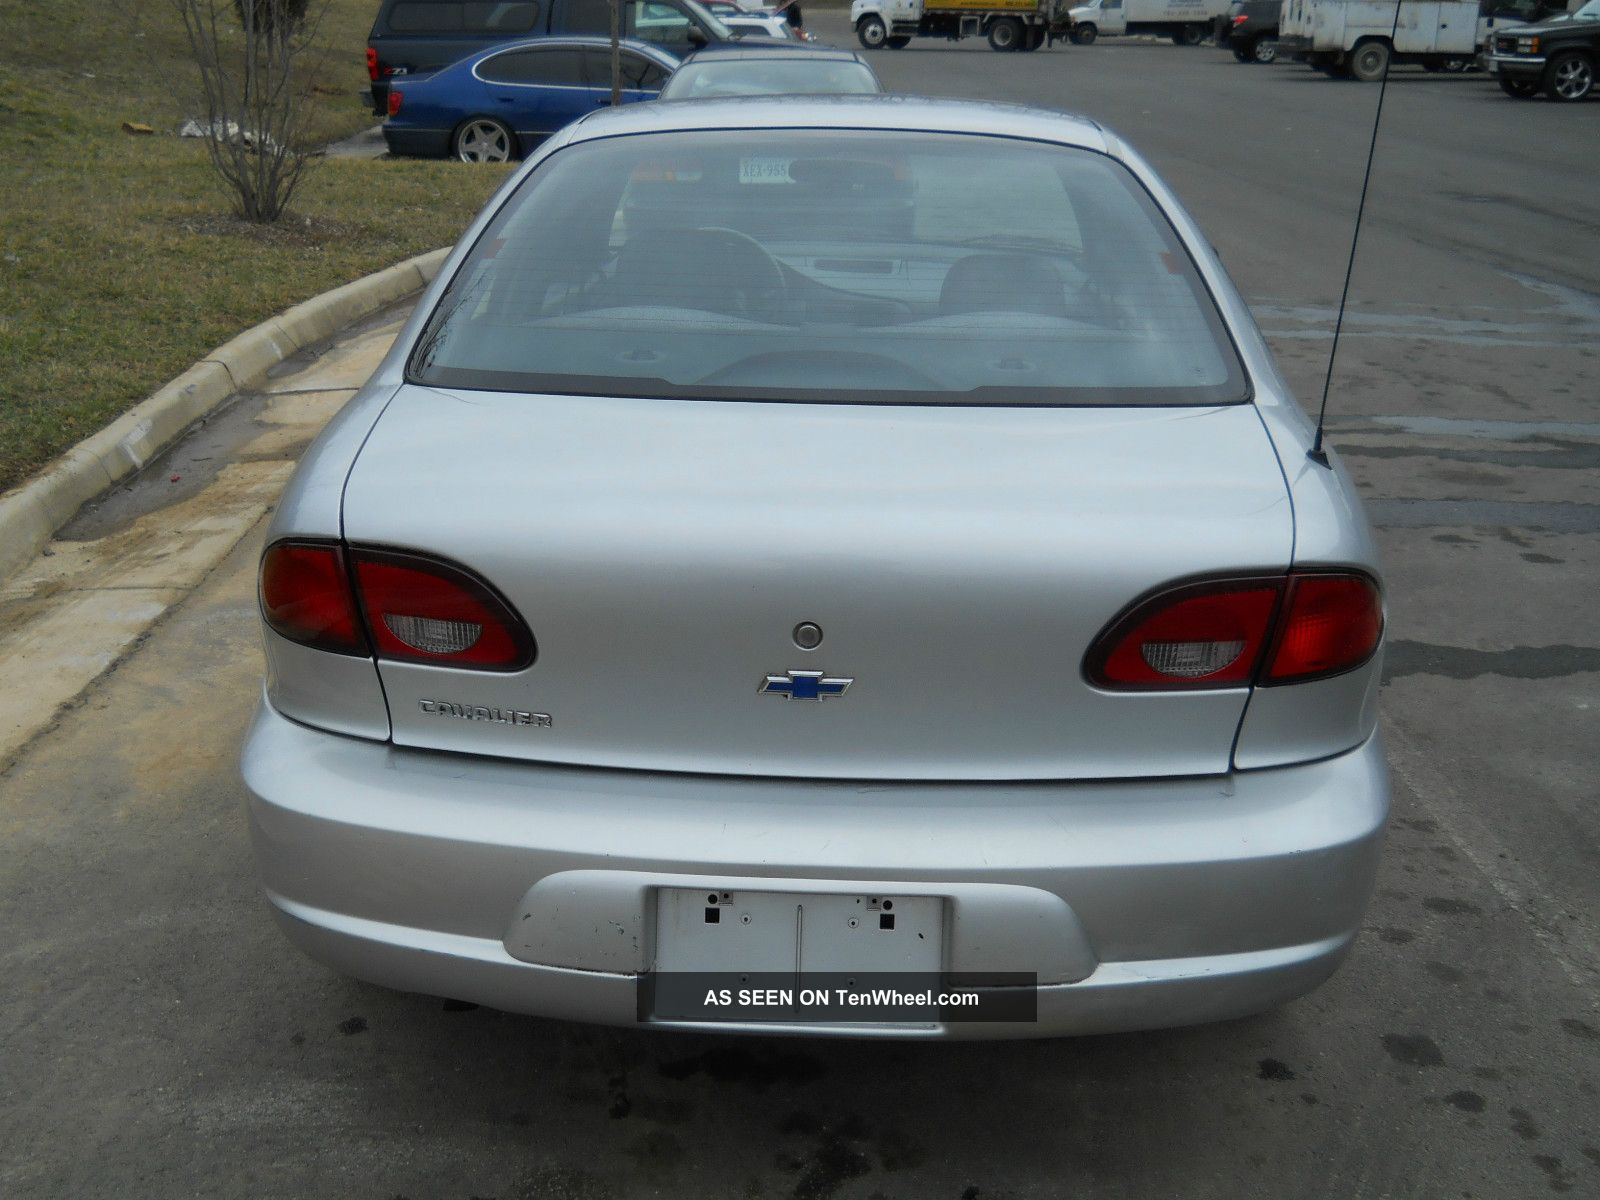 2000 Chevrolet Cavalier Base Sedan 4 Door 2 2l